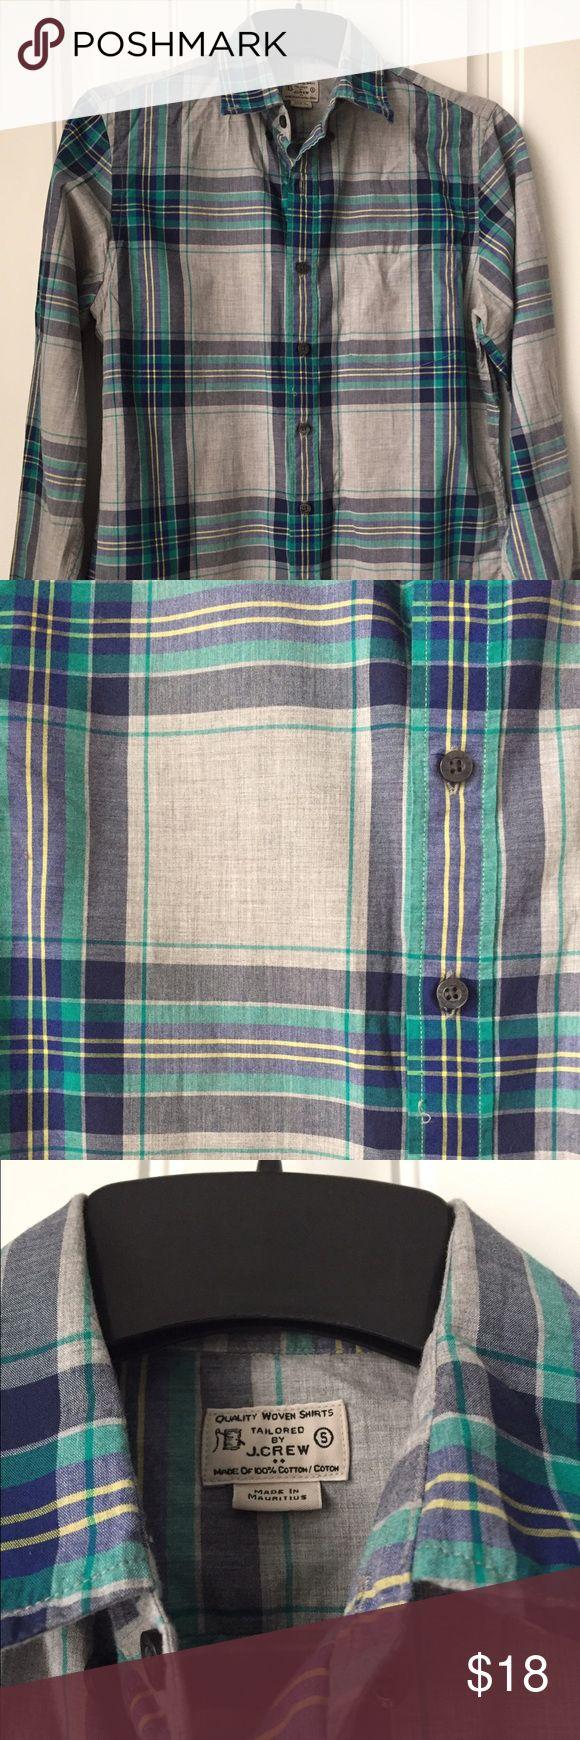 Men's J.Crew casual button-down shirt Men's J.Crew casual woven shirt size small. Button down shirt. J. Crew Shirts Casual Button Down Shirts